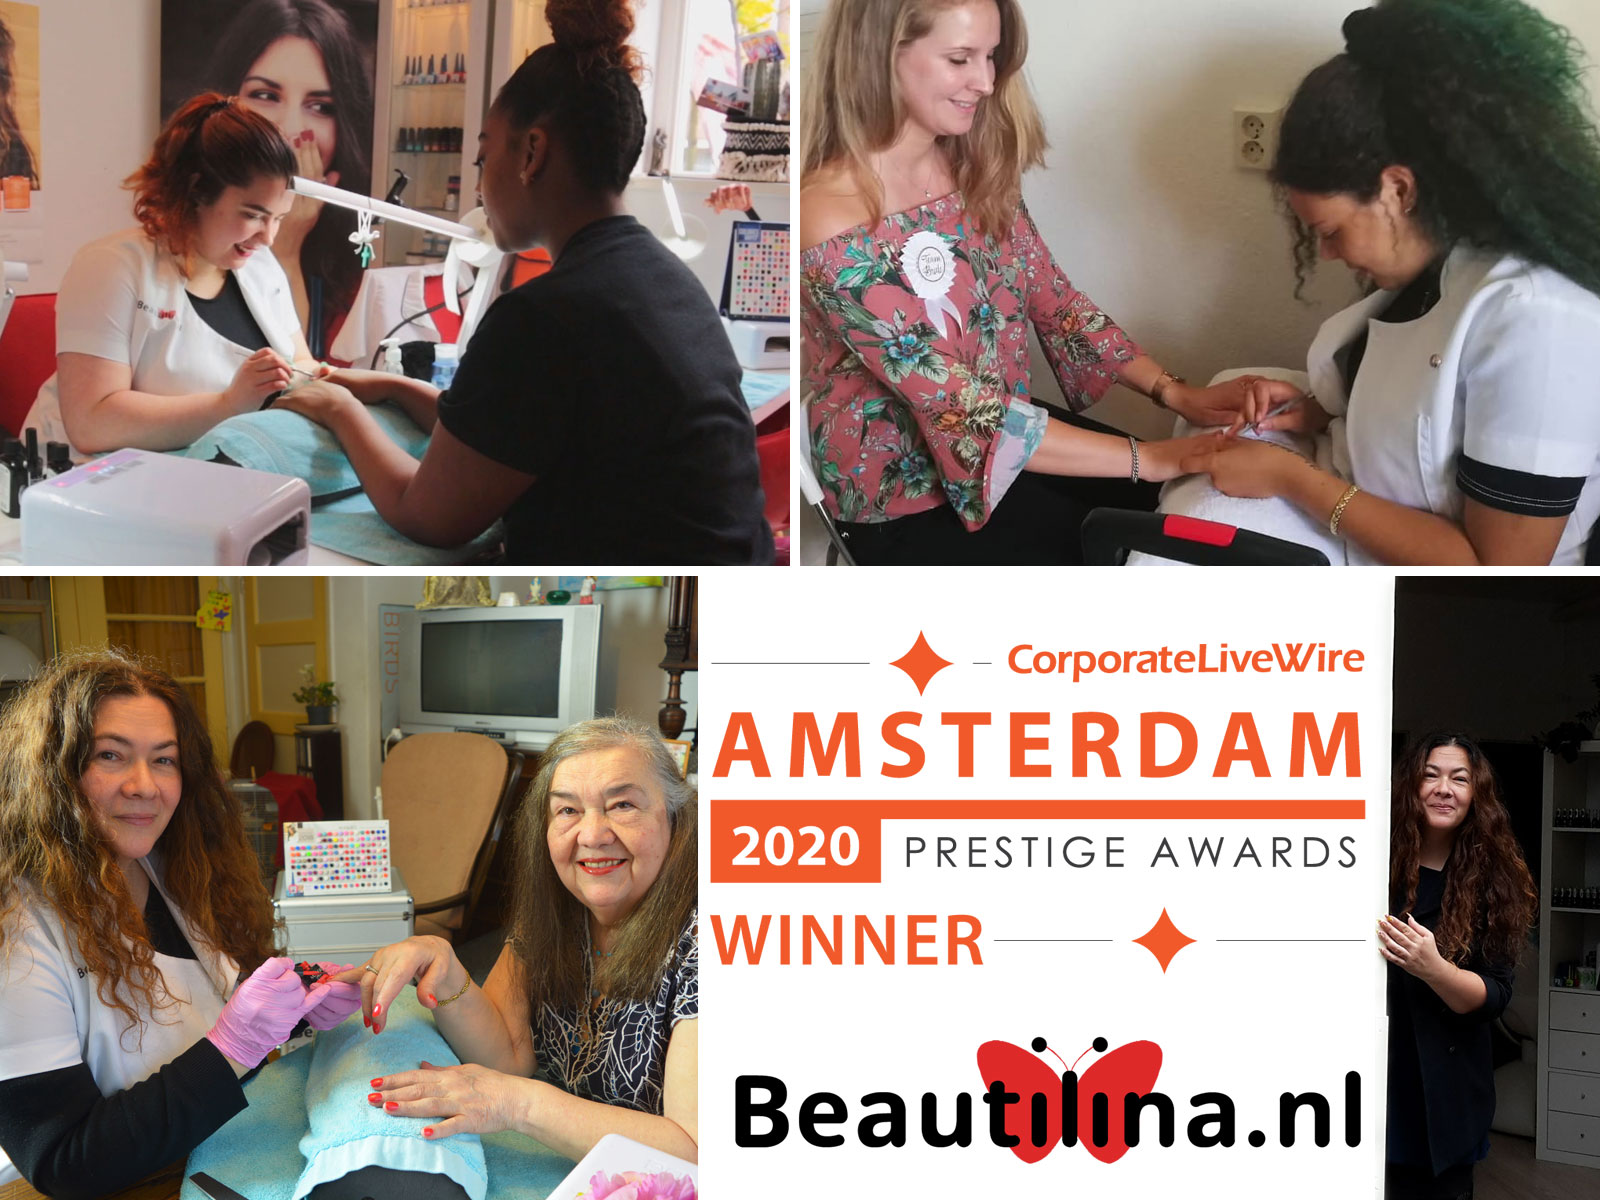 https://www.beautilina.nl/wp-content/uploads/amsterdam-prestige-awards-beste-nagelsalon1600x1200.jpg